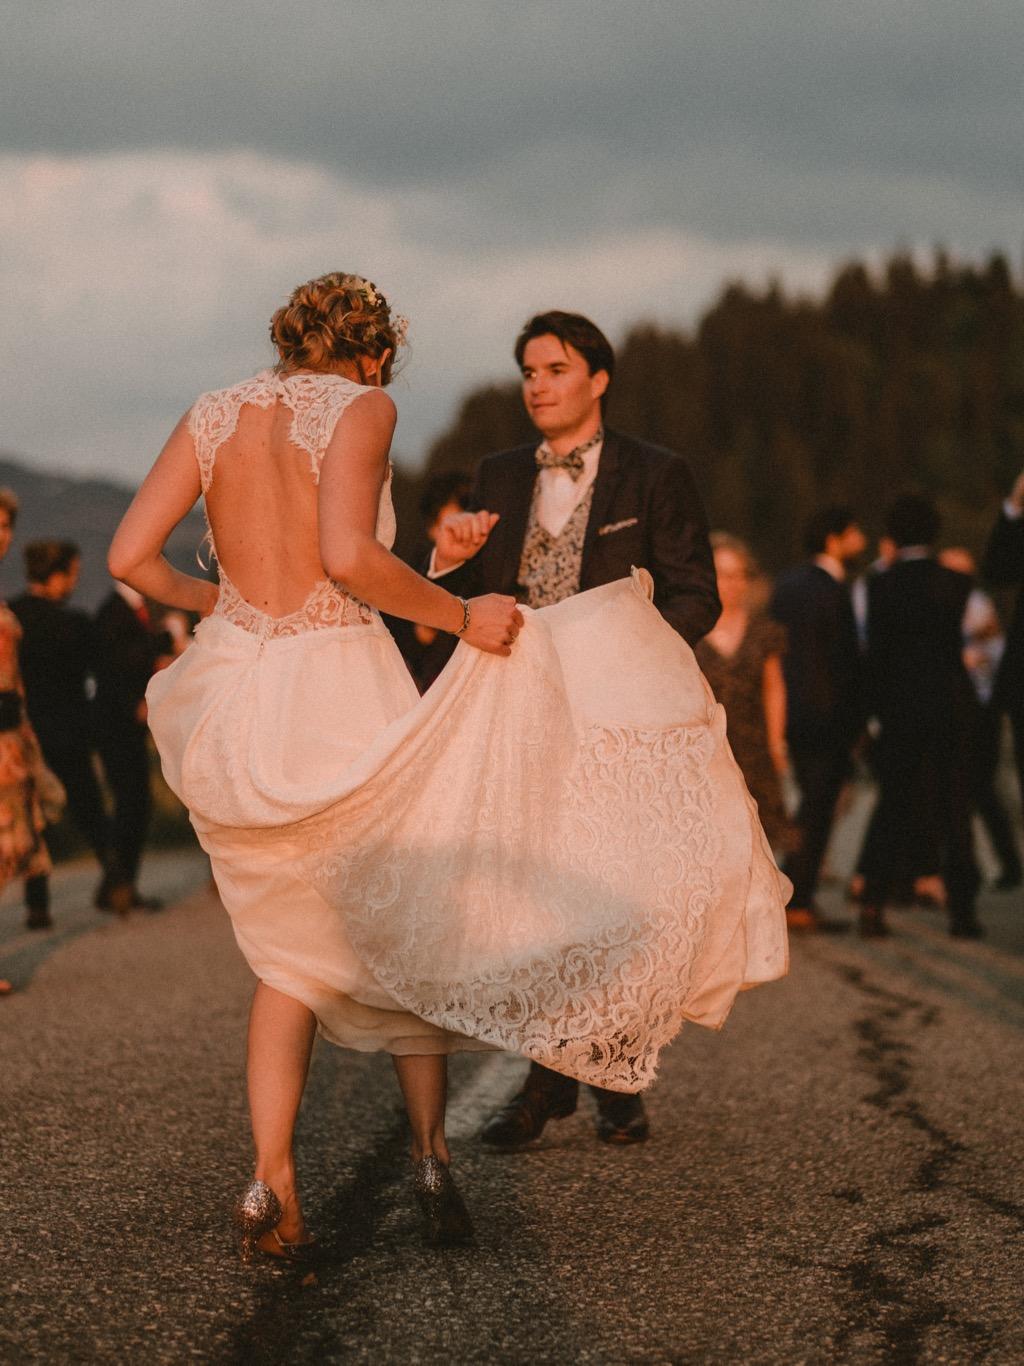 Mariés en train de dancer - Photographe : Gerald Mattel